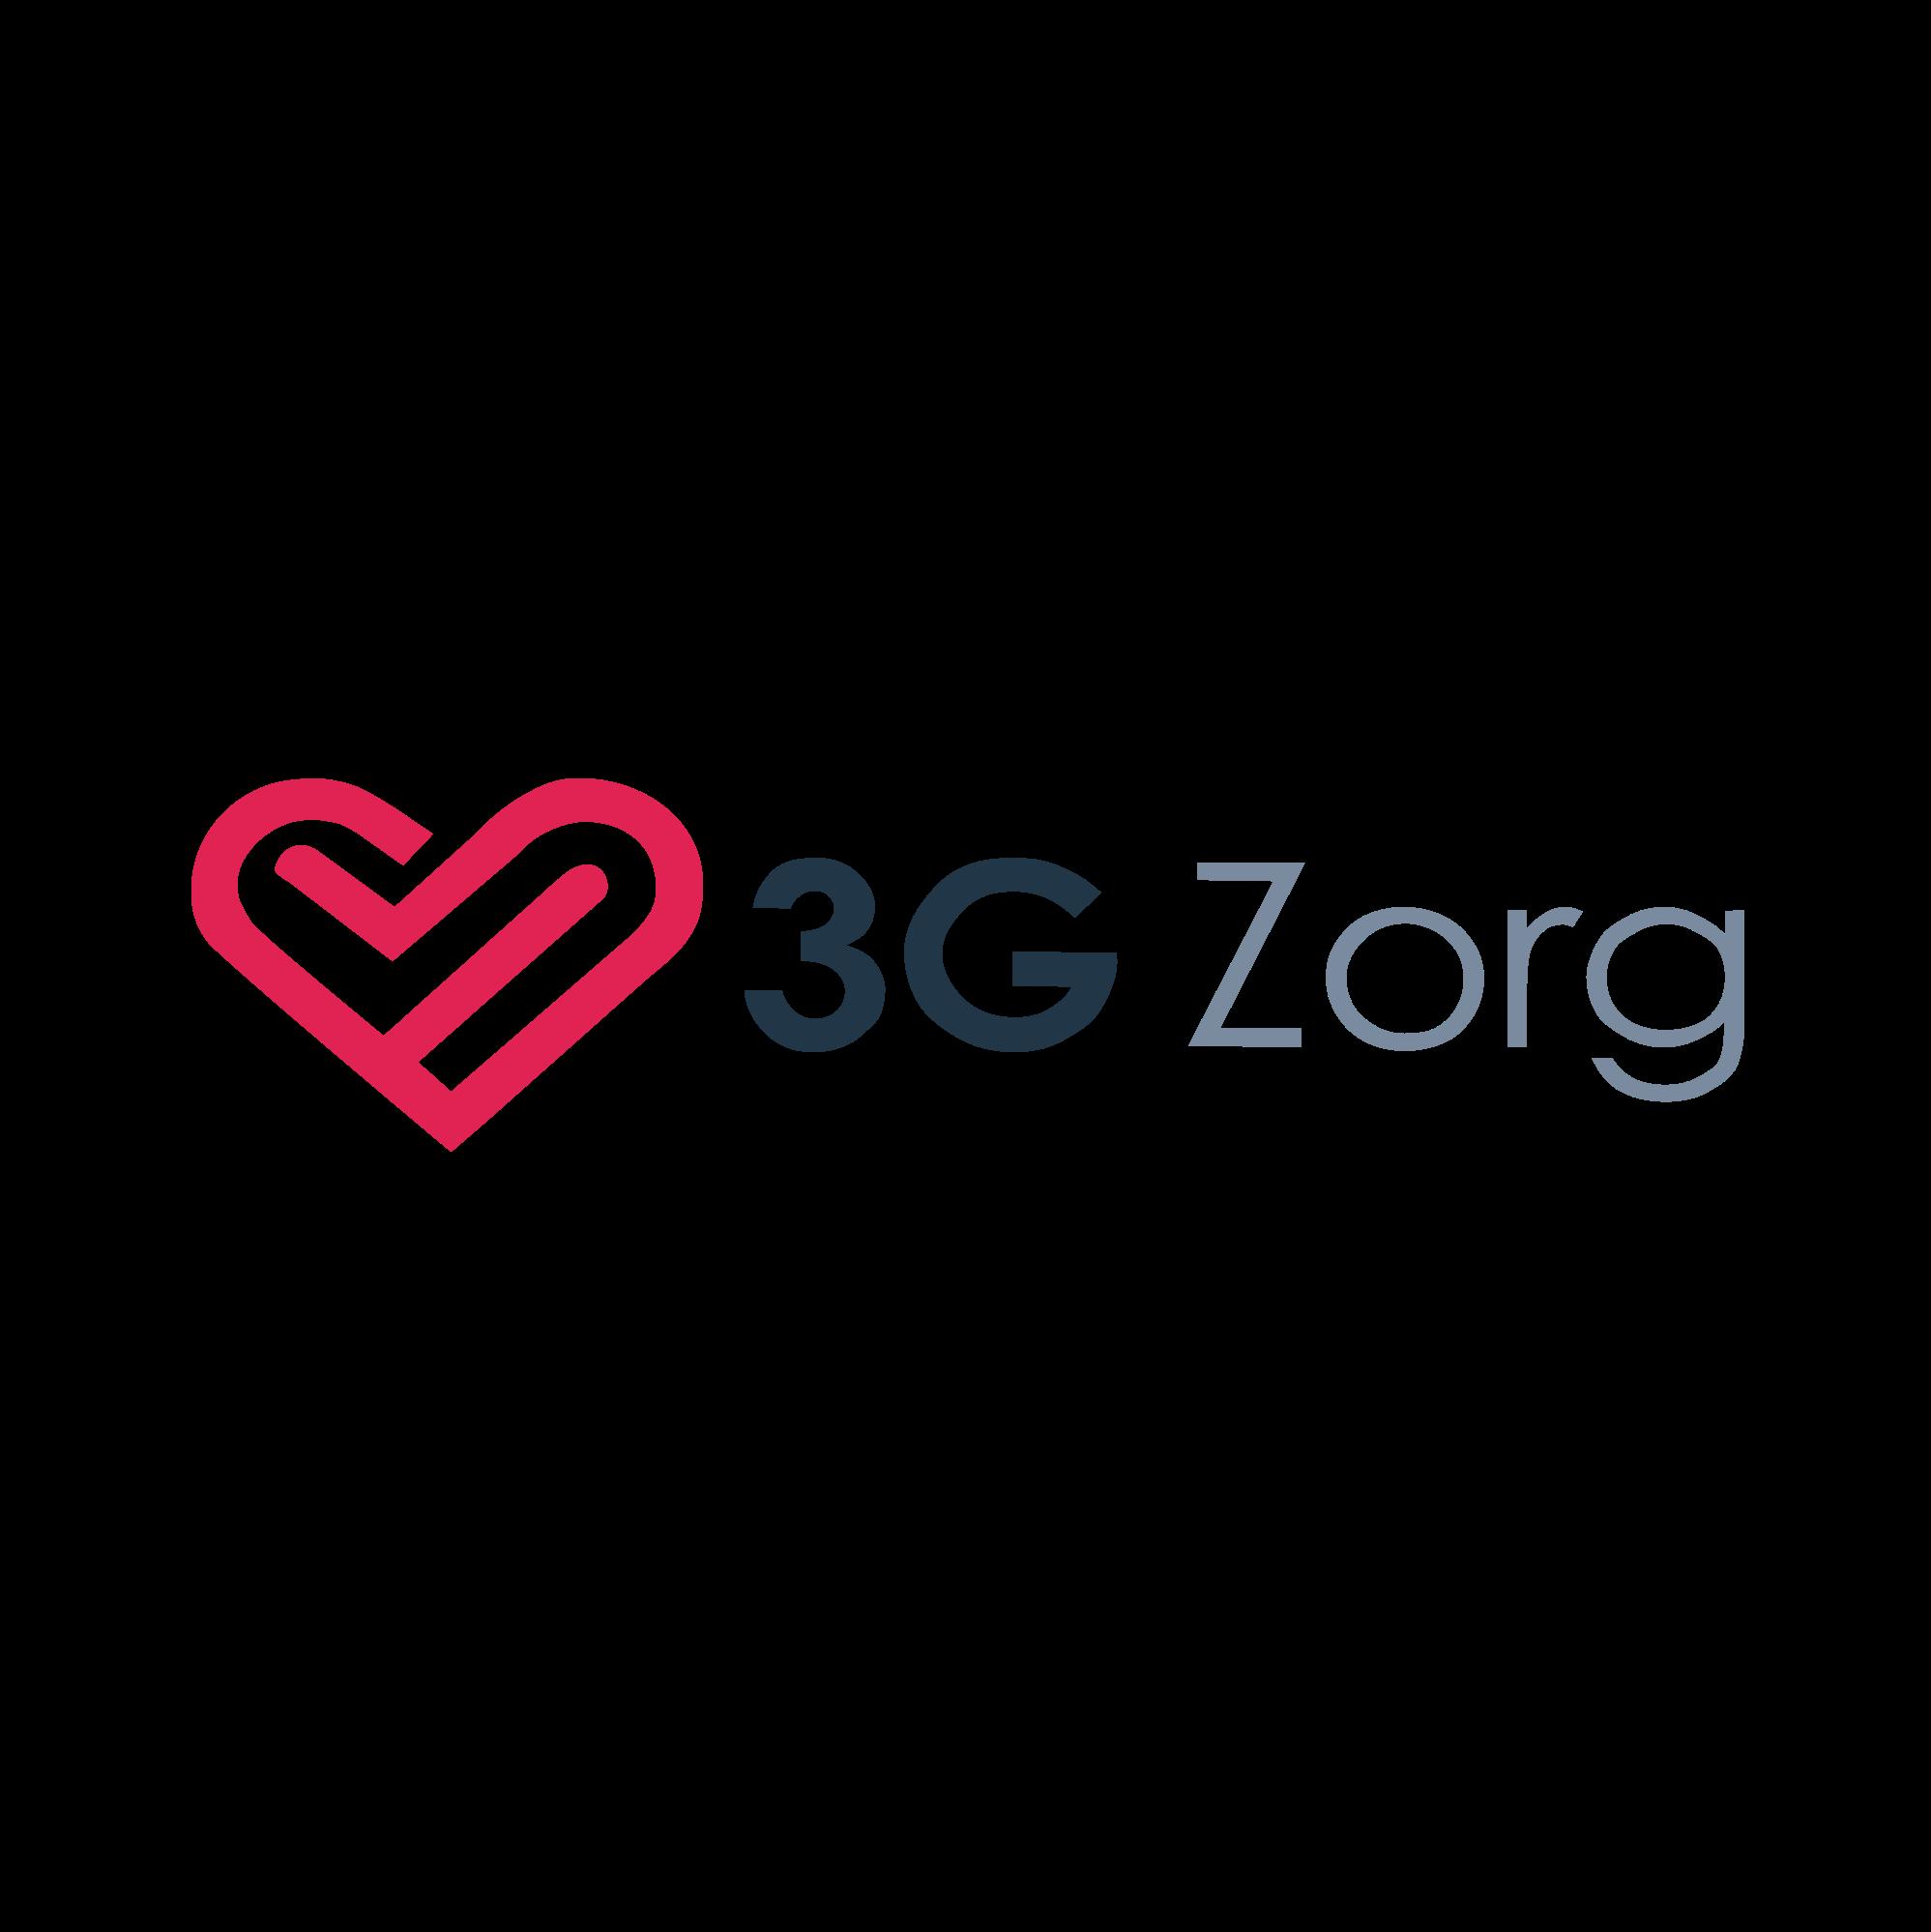 3G Zorg